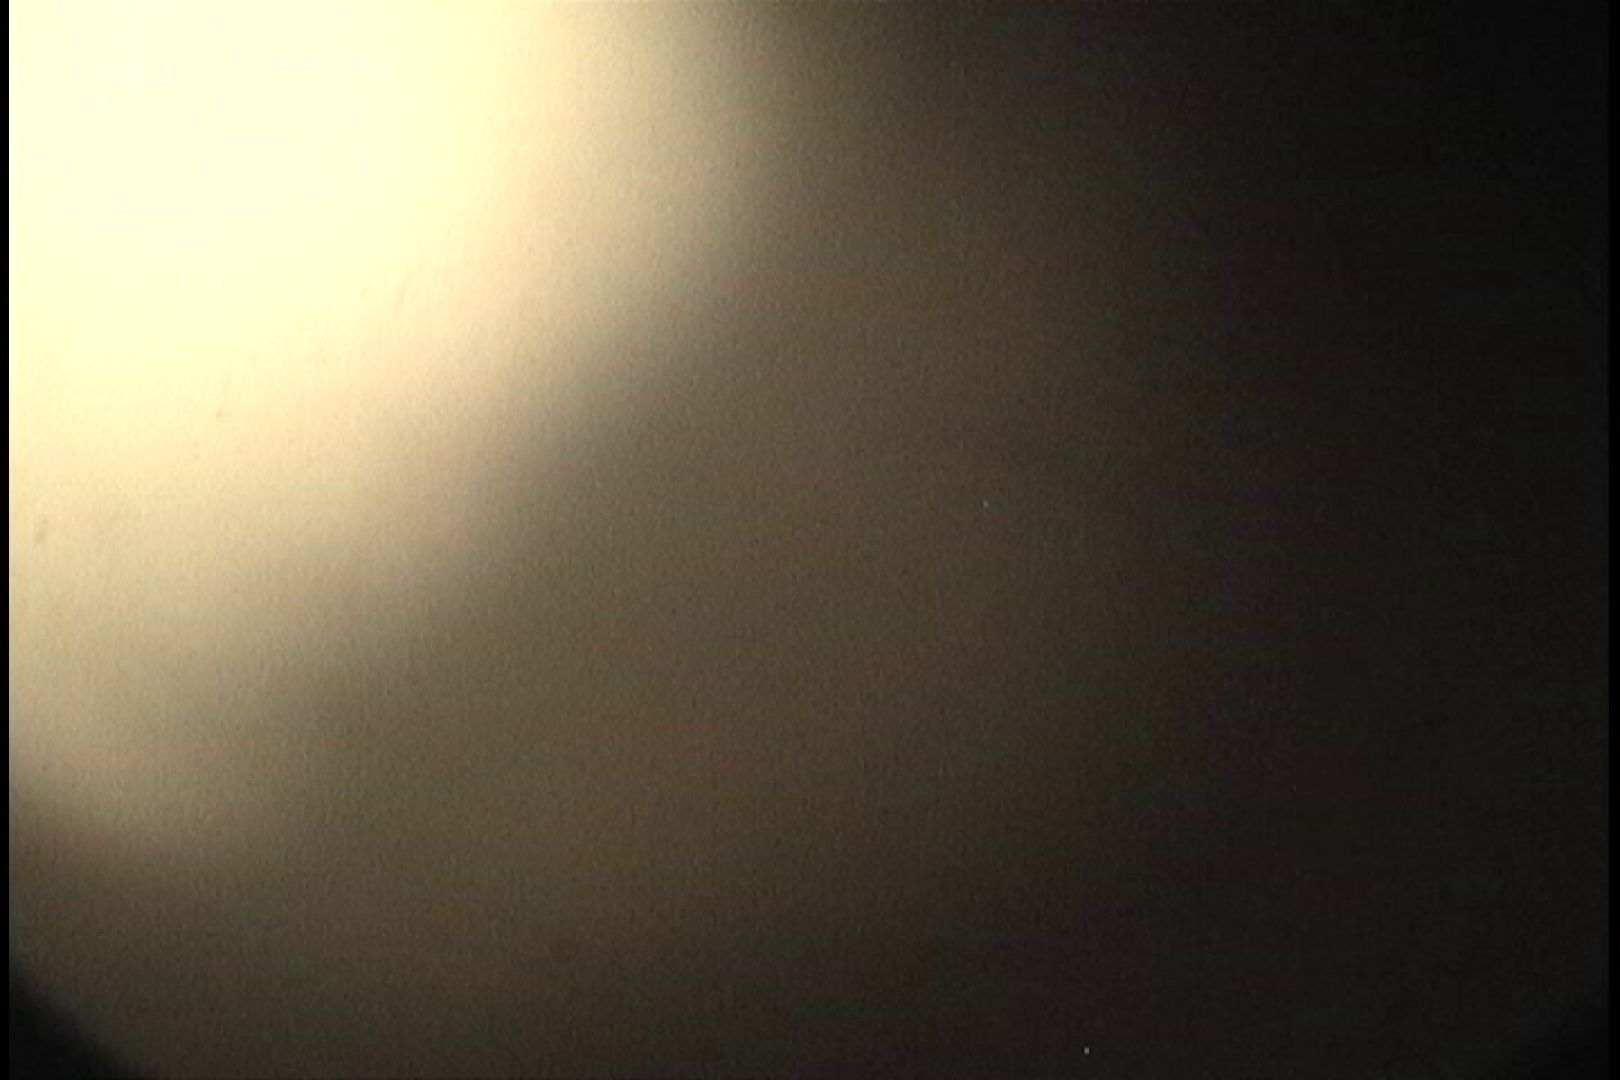 No.27 ロケットオッパイ、モジャモジャの奥に薄っすらとスジが! 接写 オマンコ無修正動画無料 103枚 65